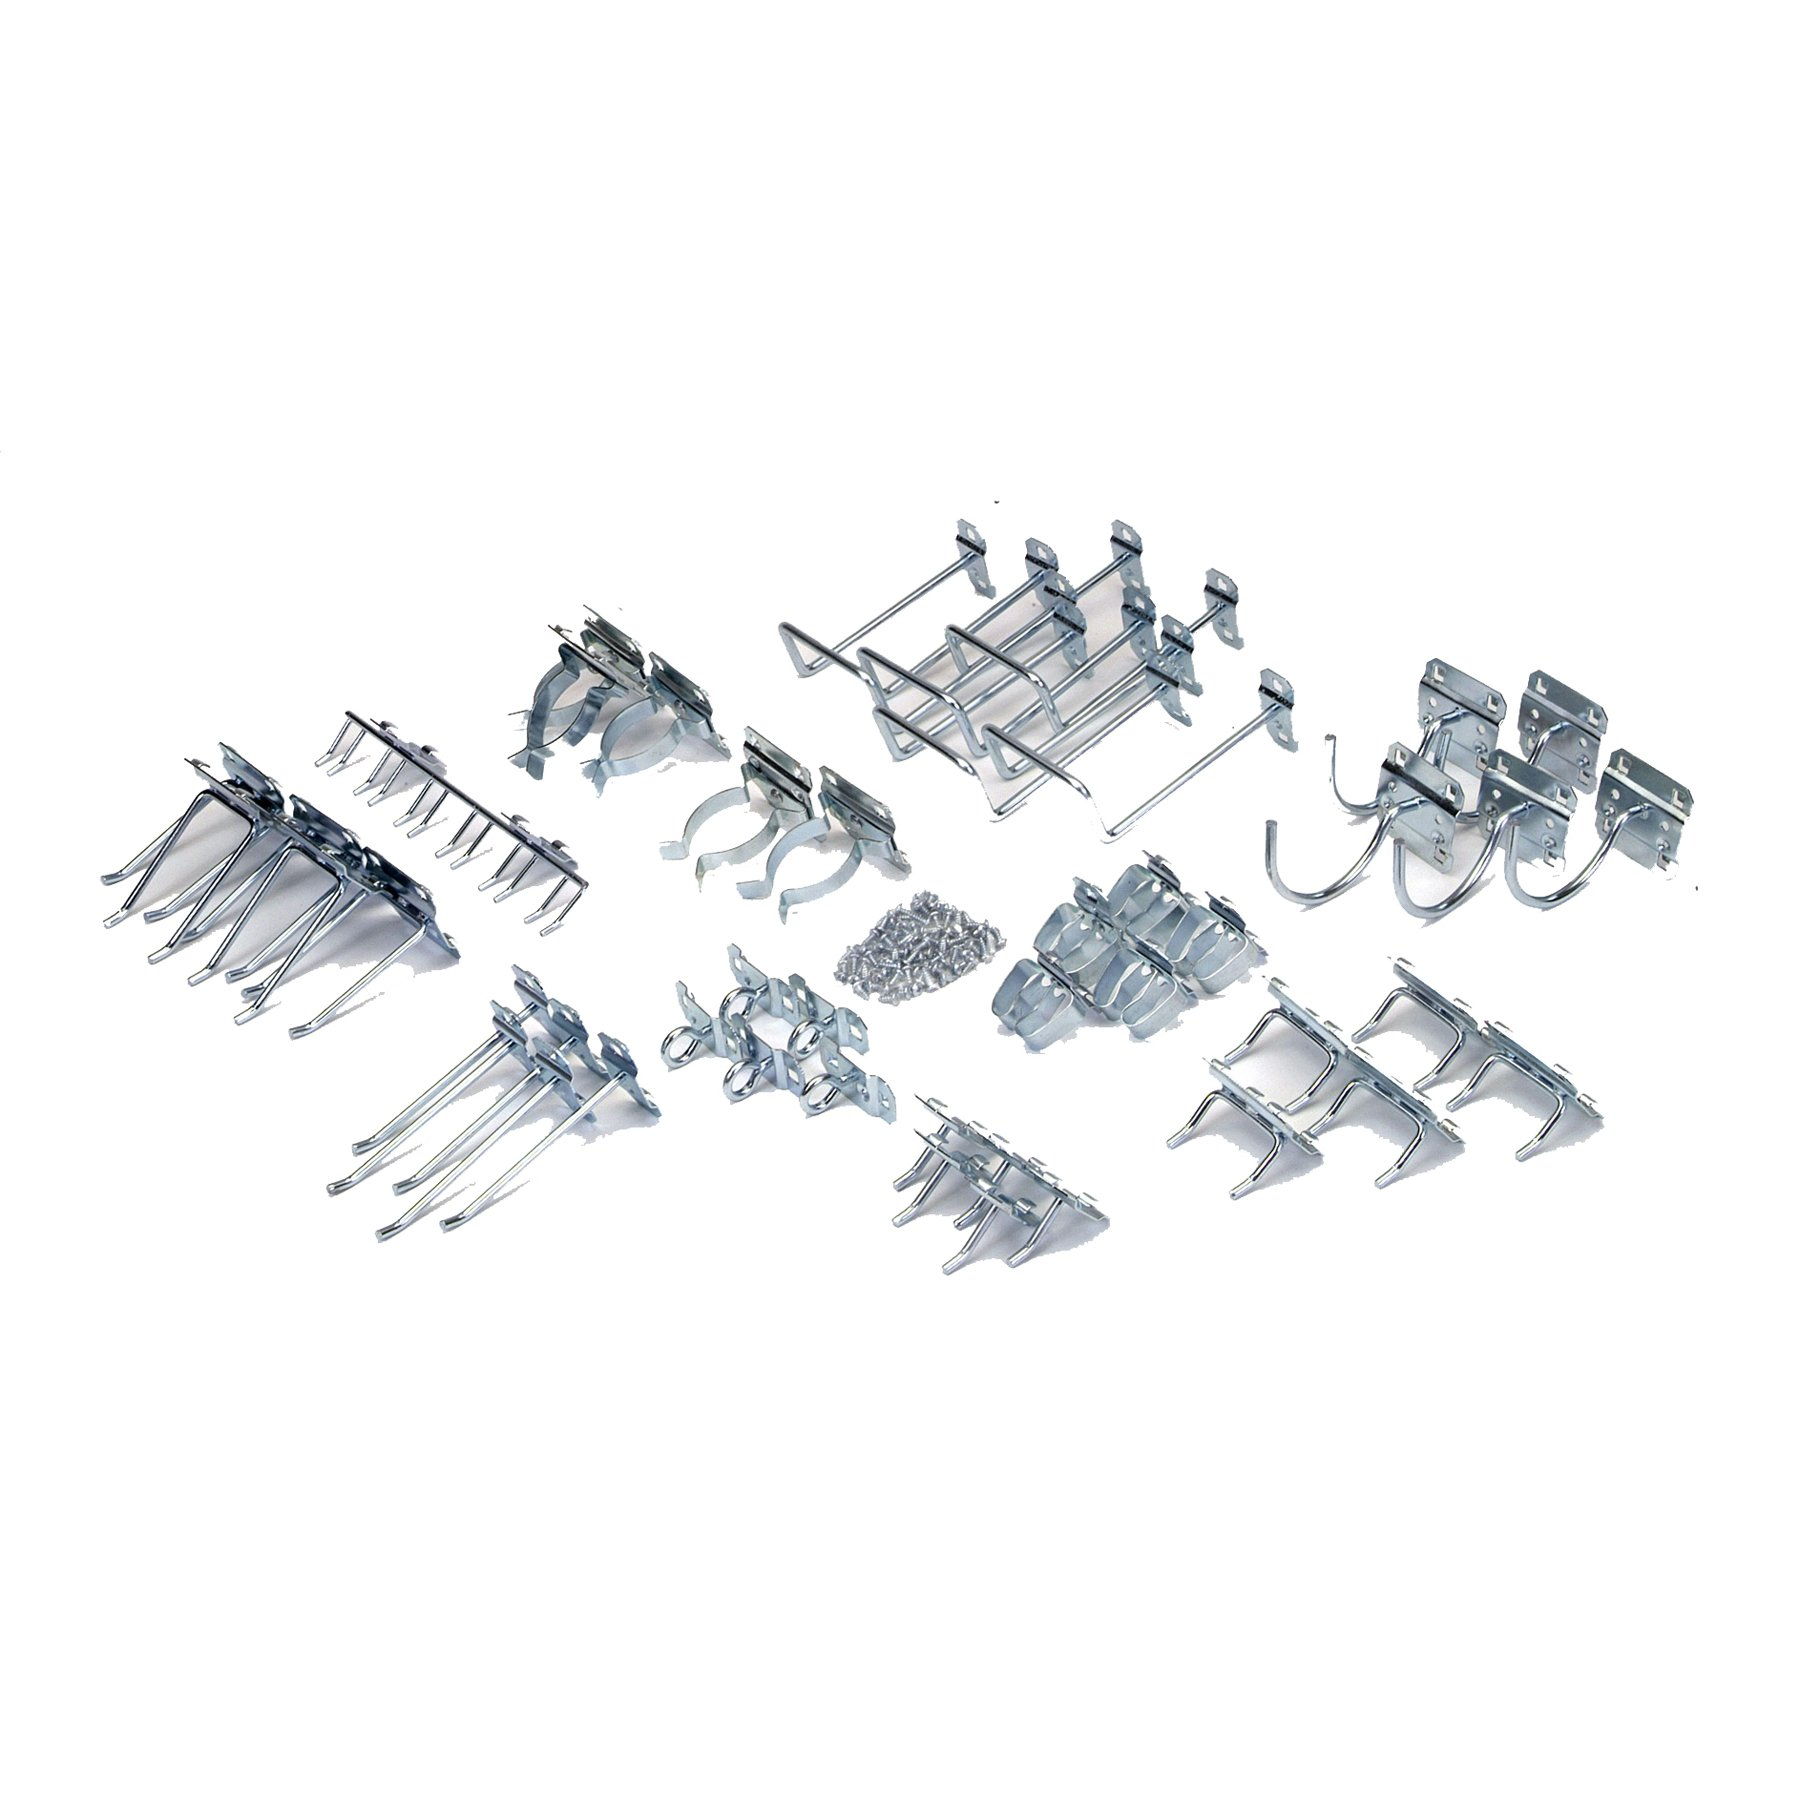 Triton Products LH1-KIT LocHook 46-Piece Zinc Plated Steel Hook Assortment for Locboard